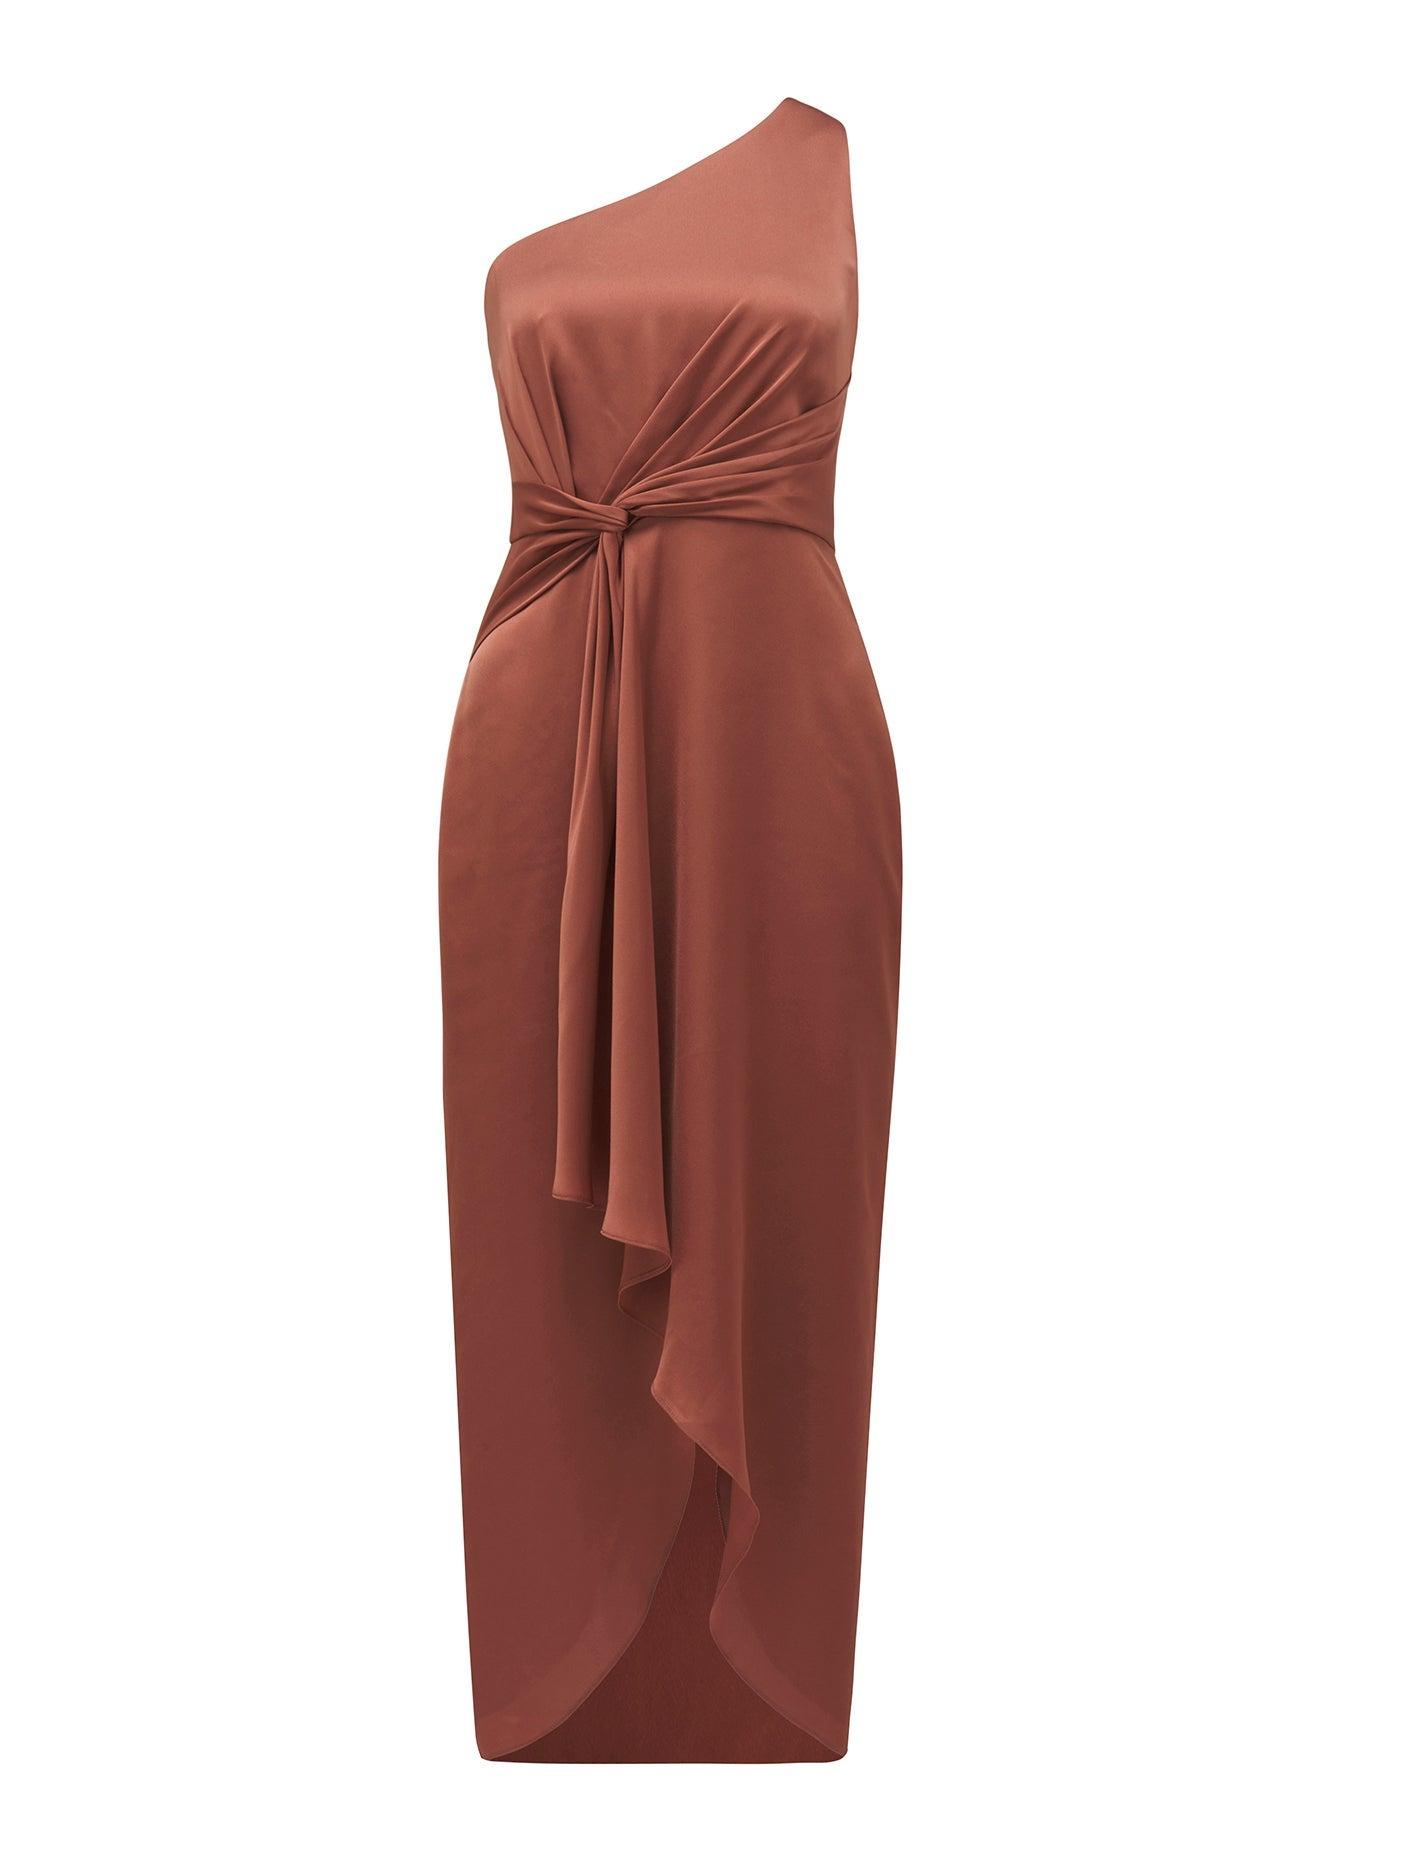 Haidee One-Shoulder Midi Dress